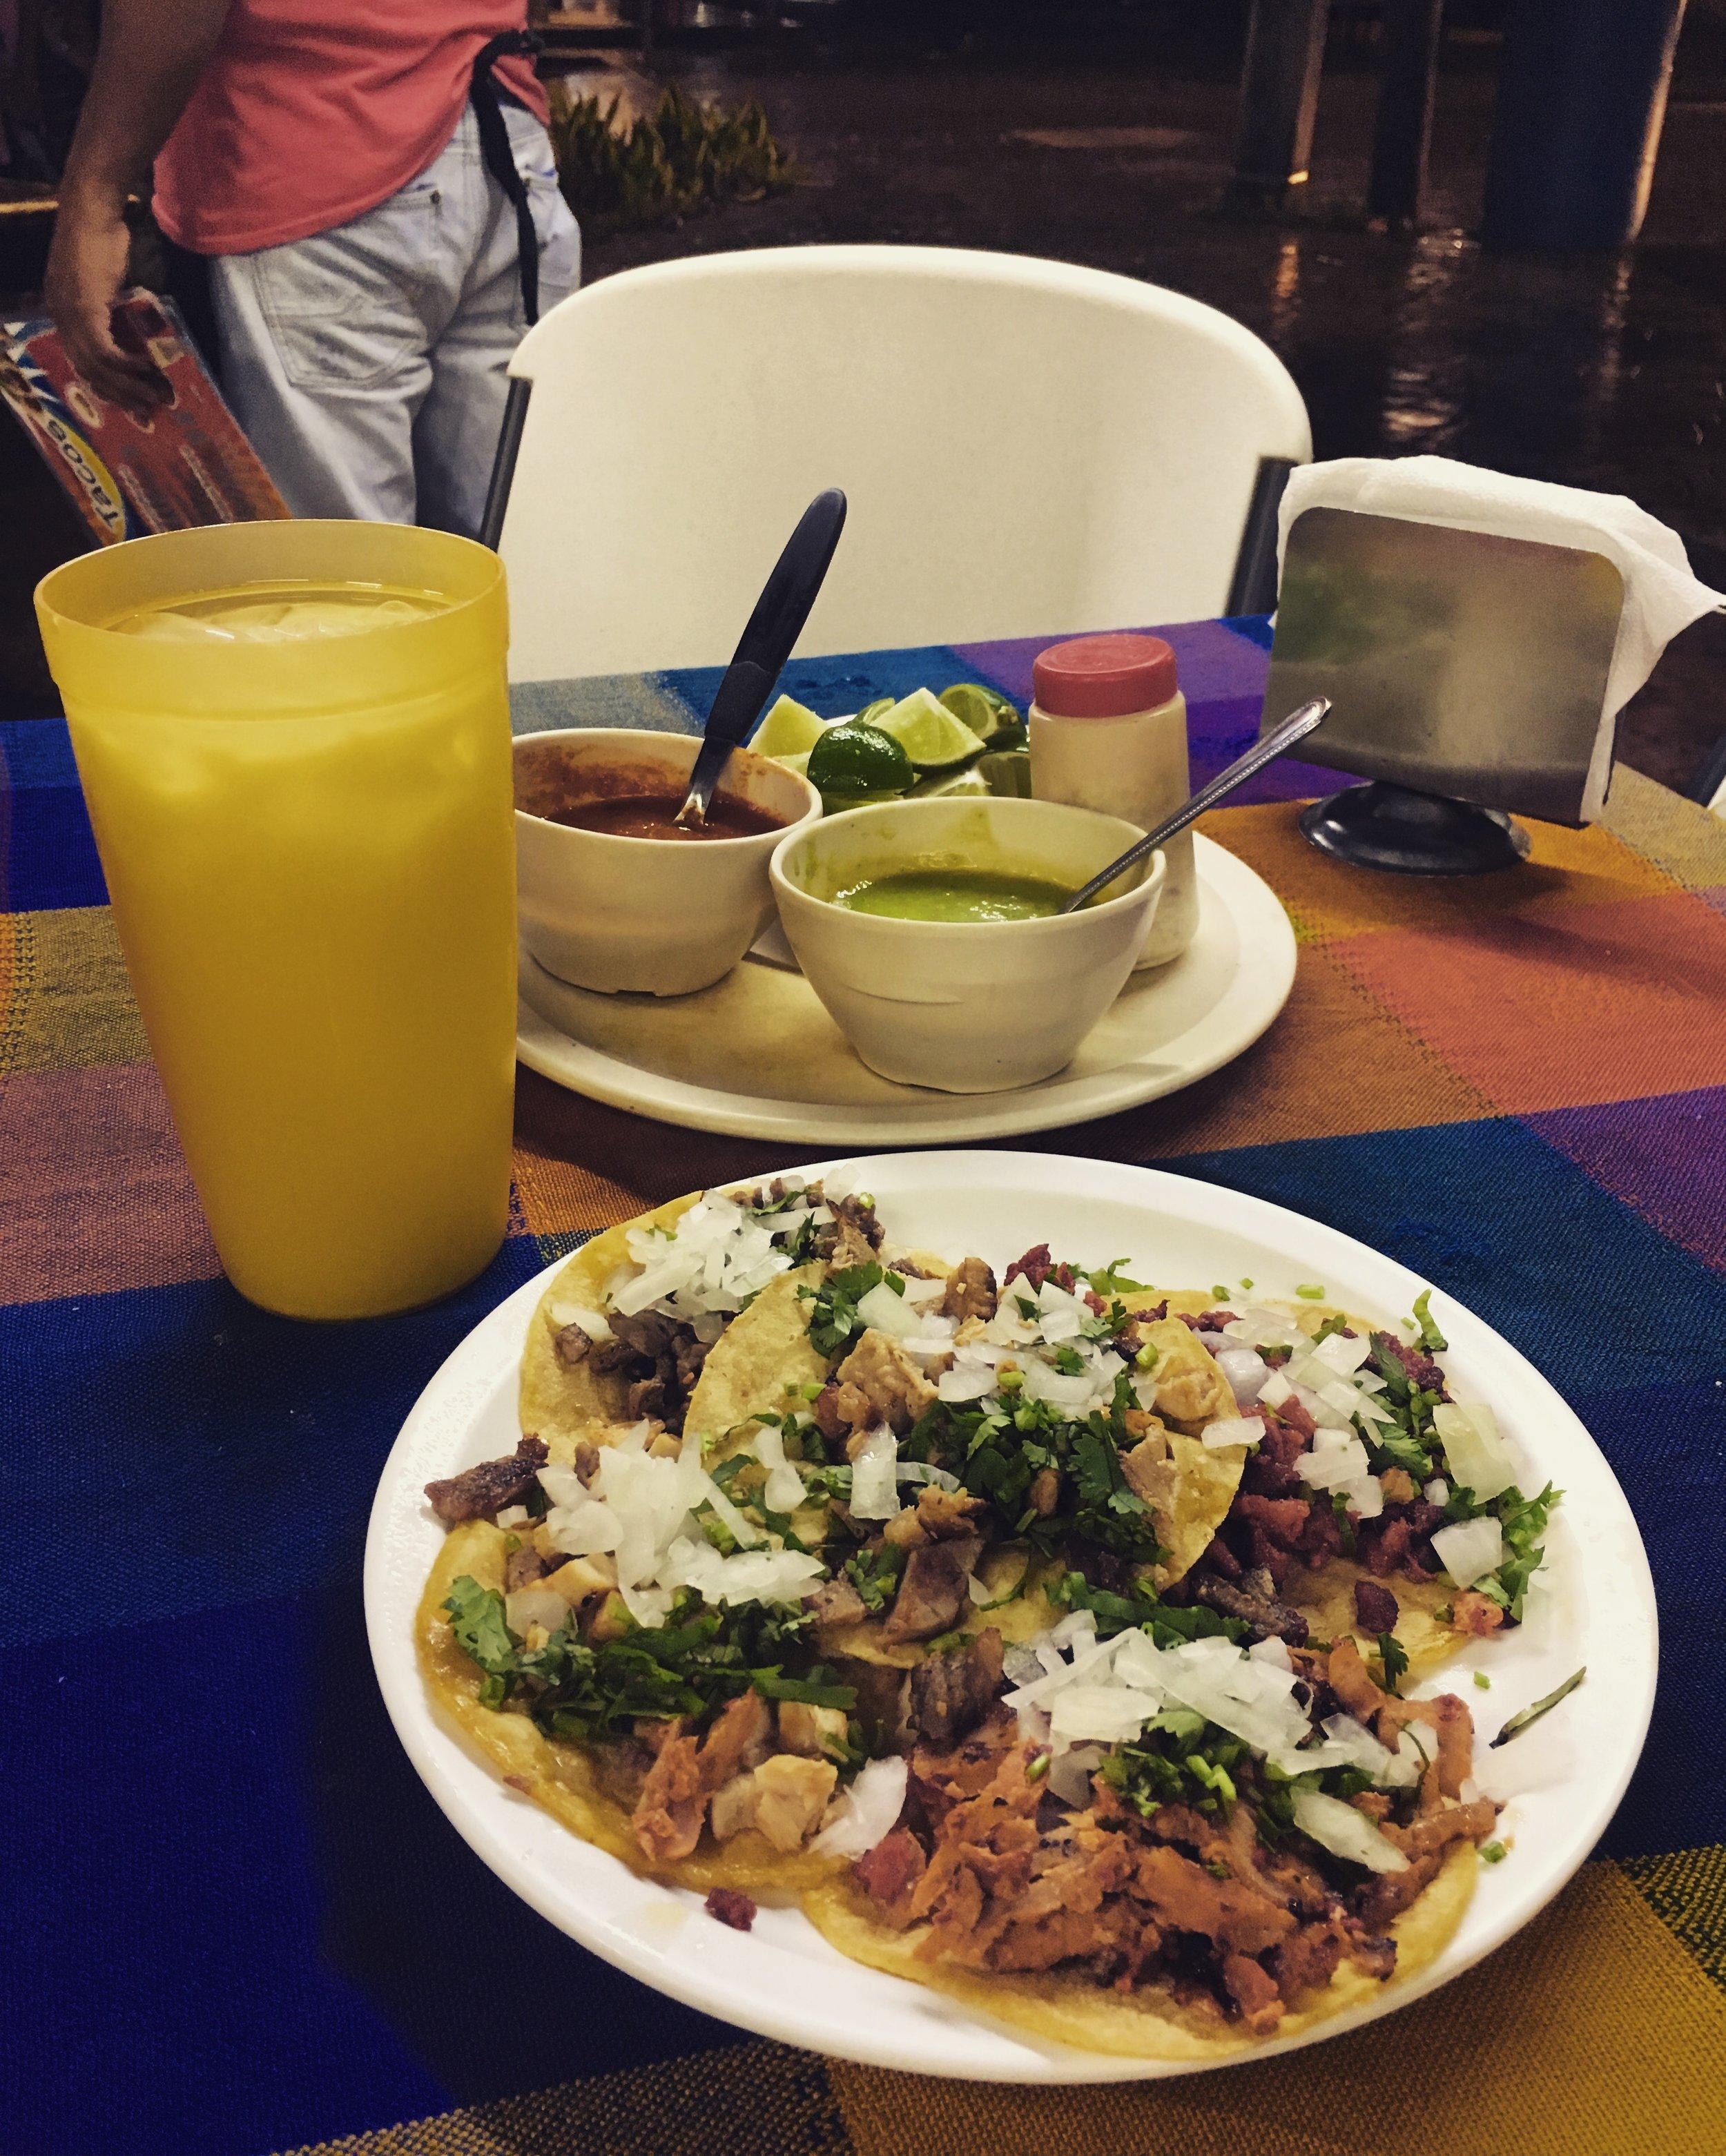 playa-del-carmen-food-3.JPG